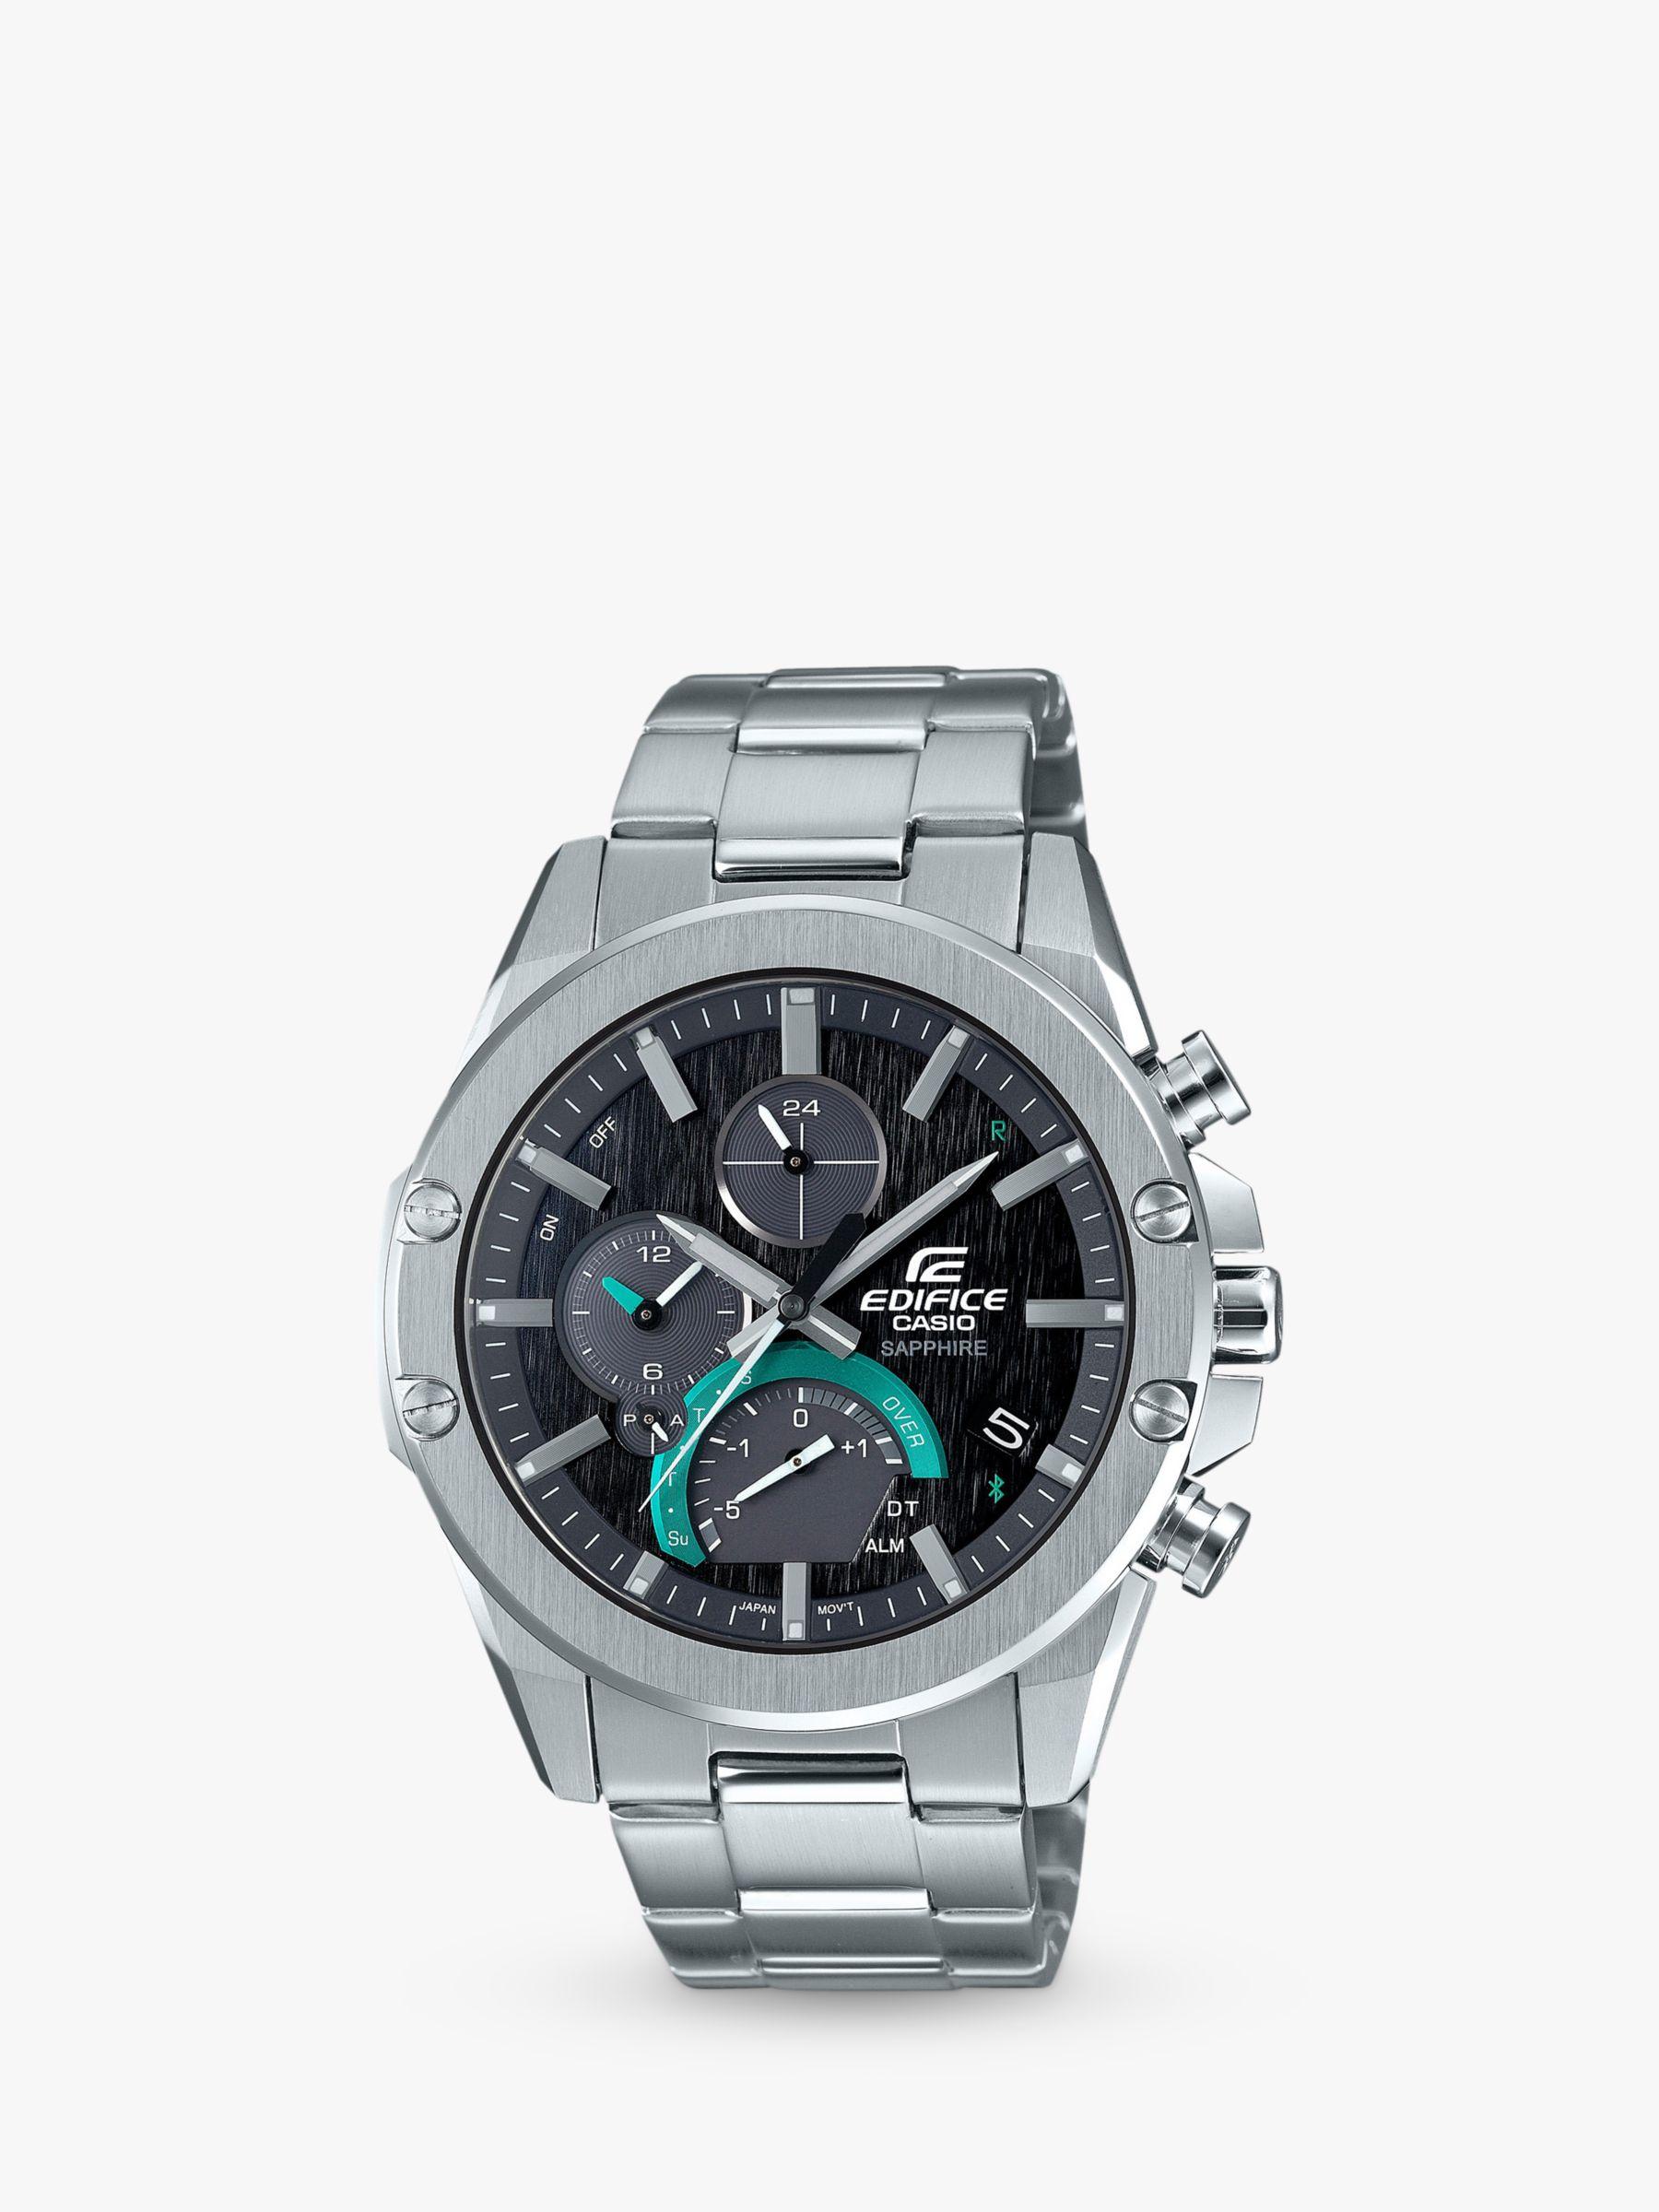 Casio Casio EQB-1000D-1AER Men's Edifice Chronograph Date Bracelet Strap Watch, Silver/Black